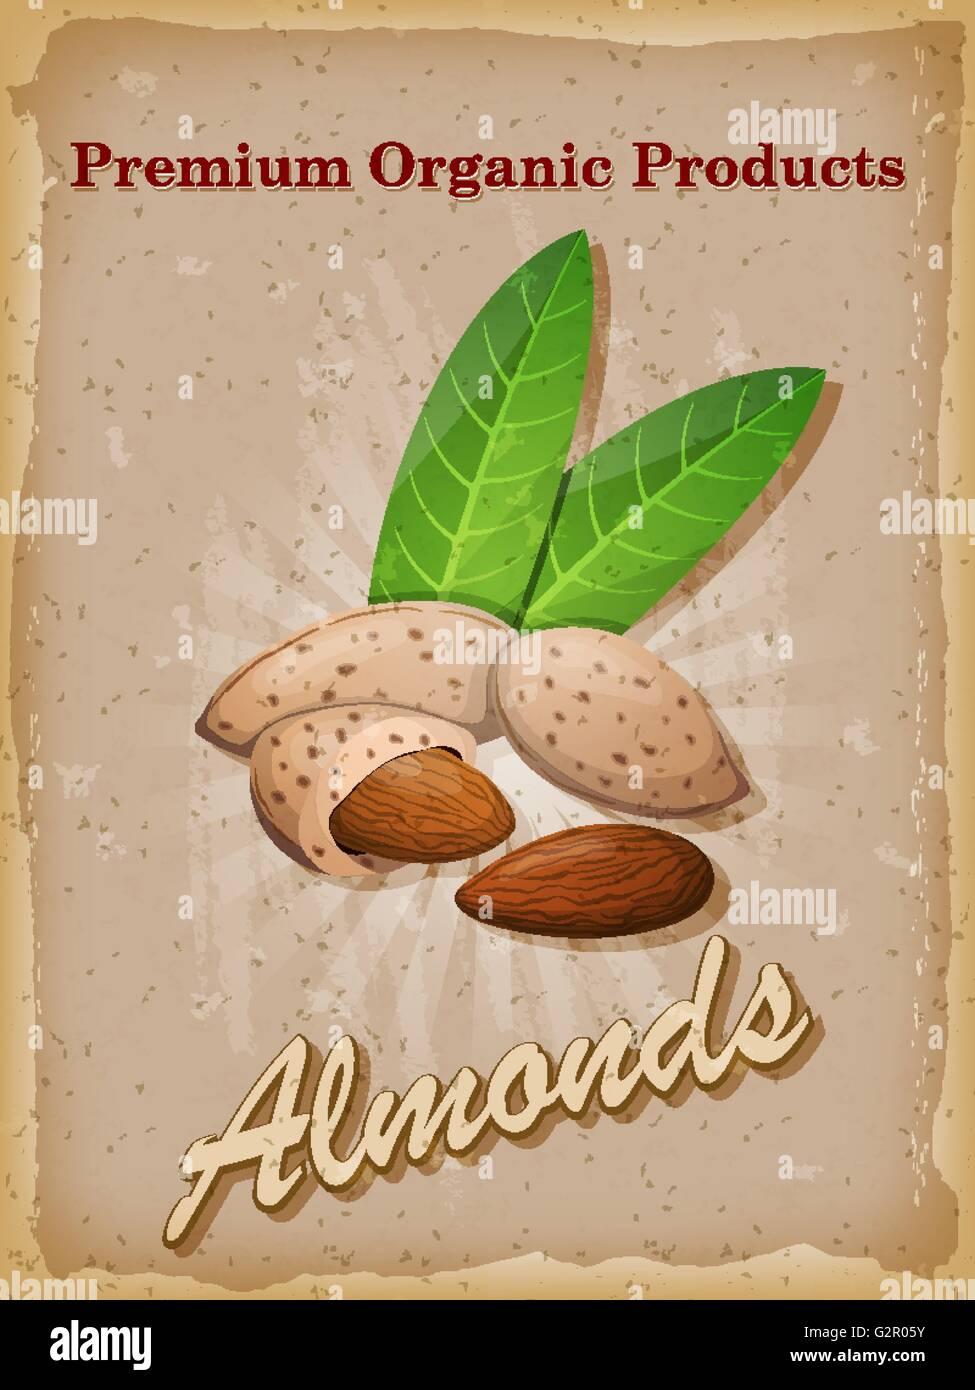 Almonds Vintage Poster Vector Illustration Stock Vector Art